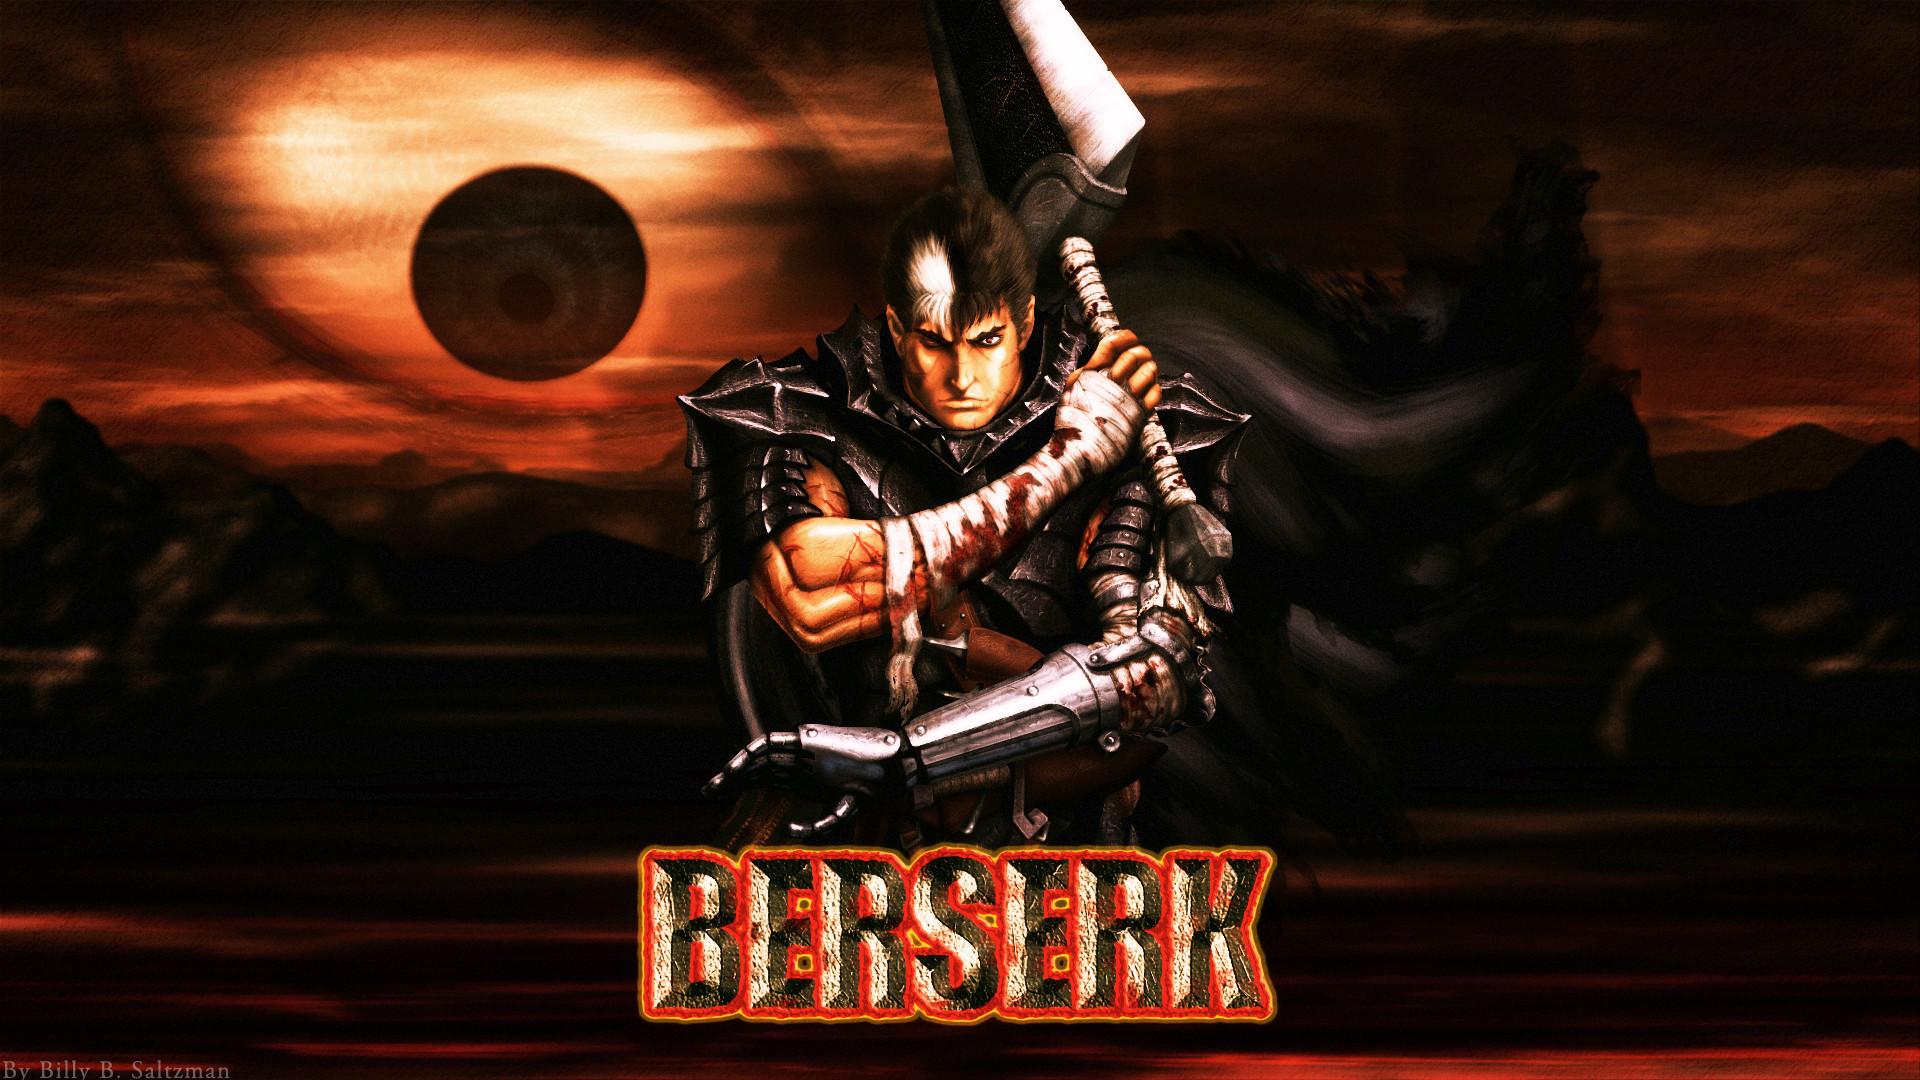 Berserk-Wallpaper-HD-1920×1080.jpg, …